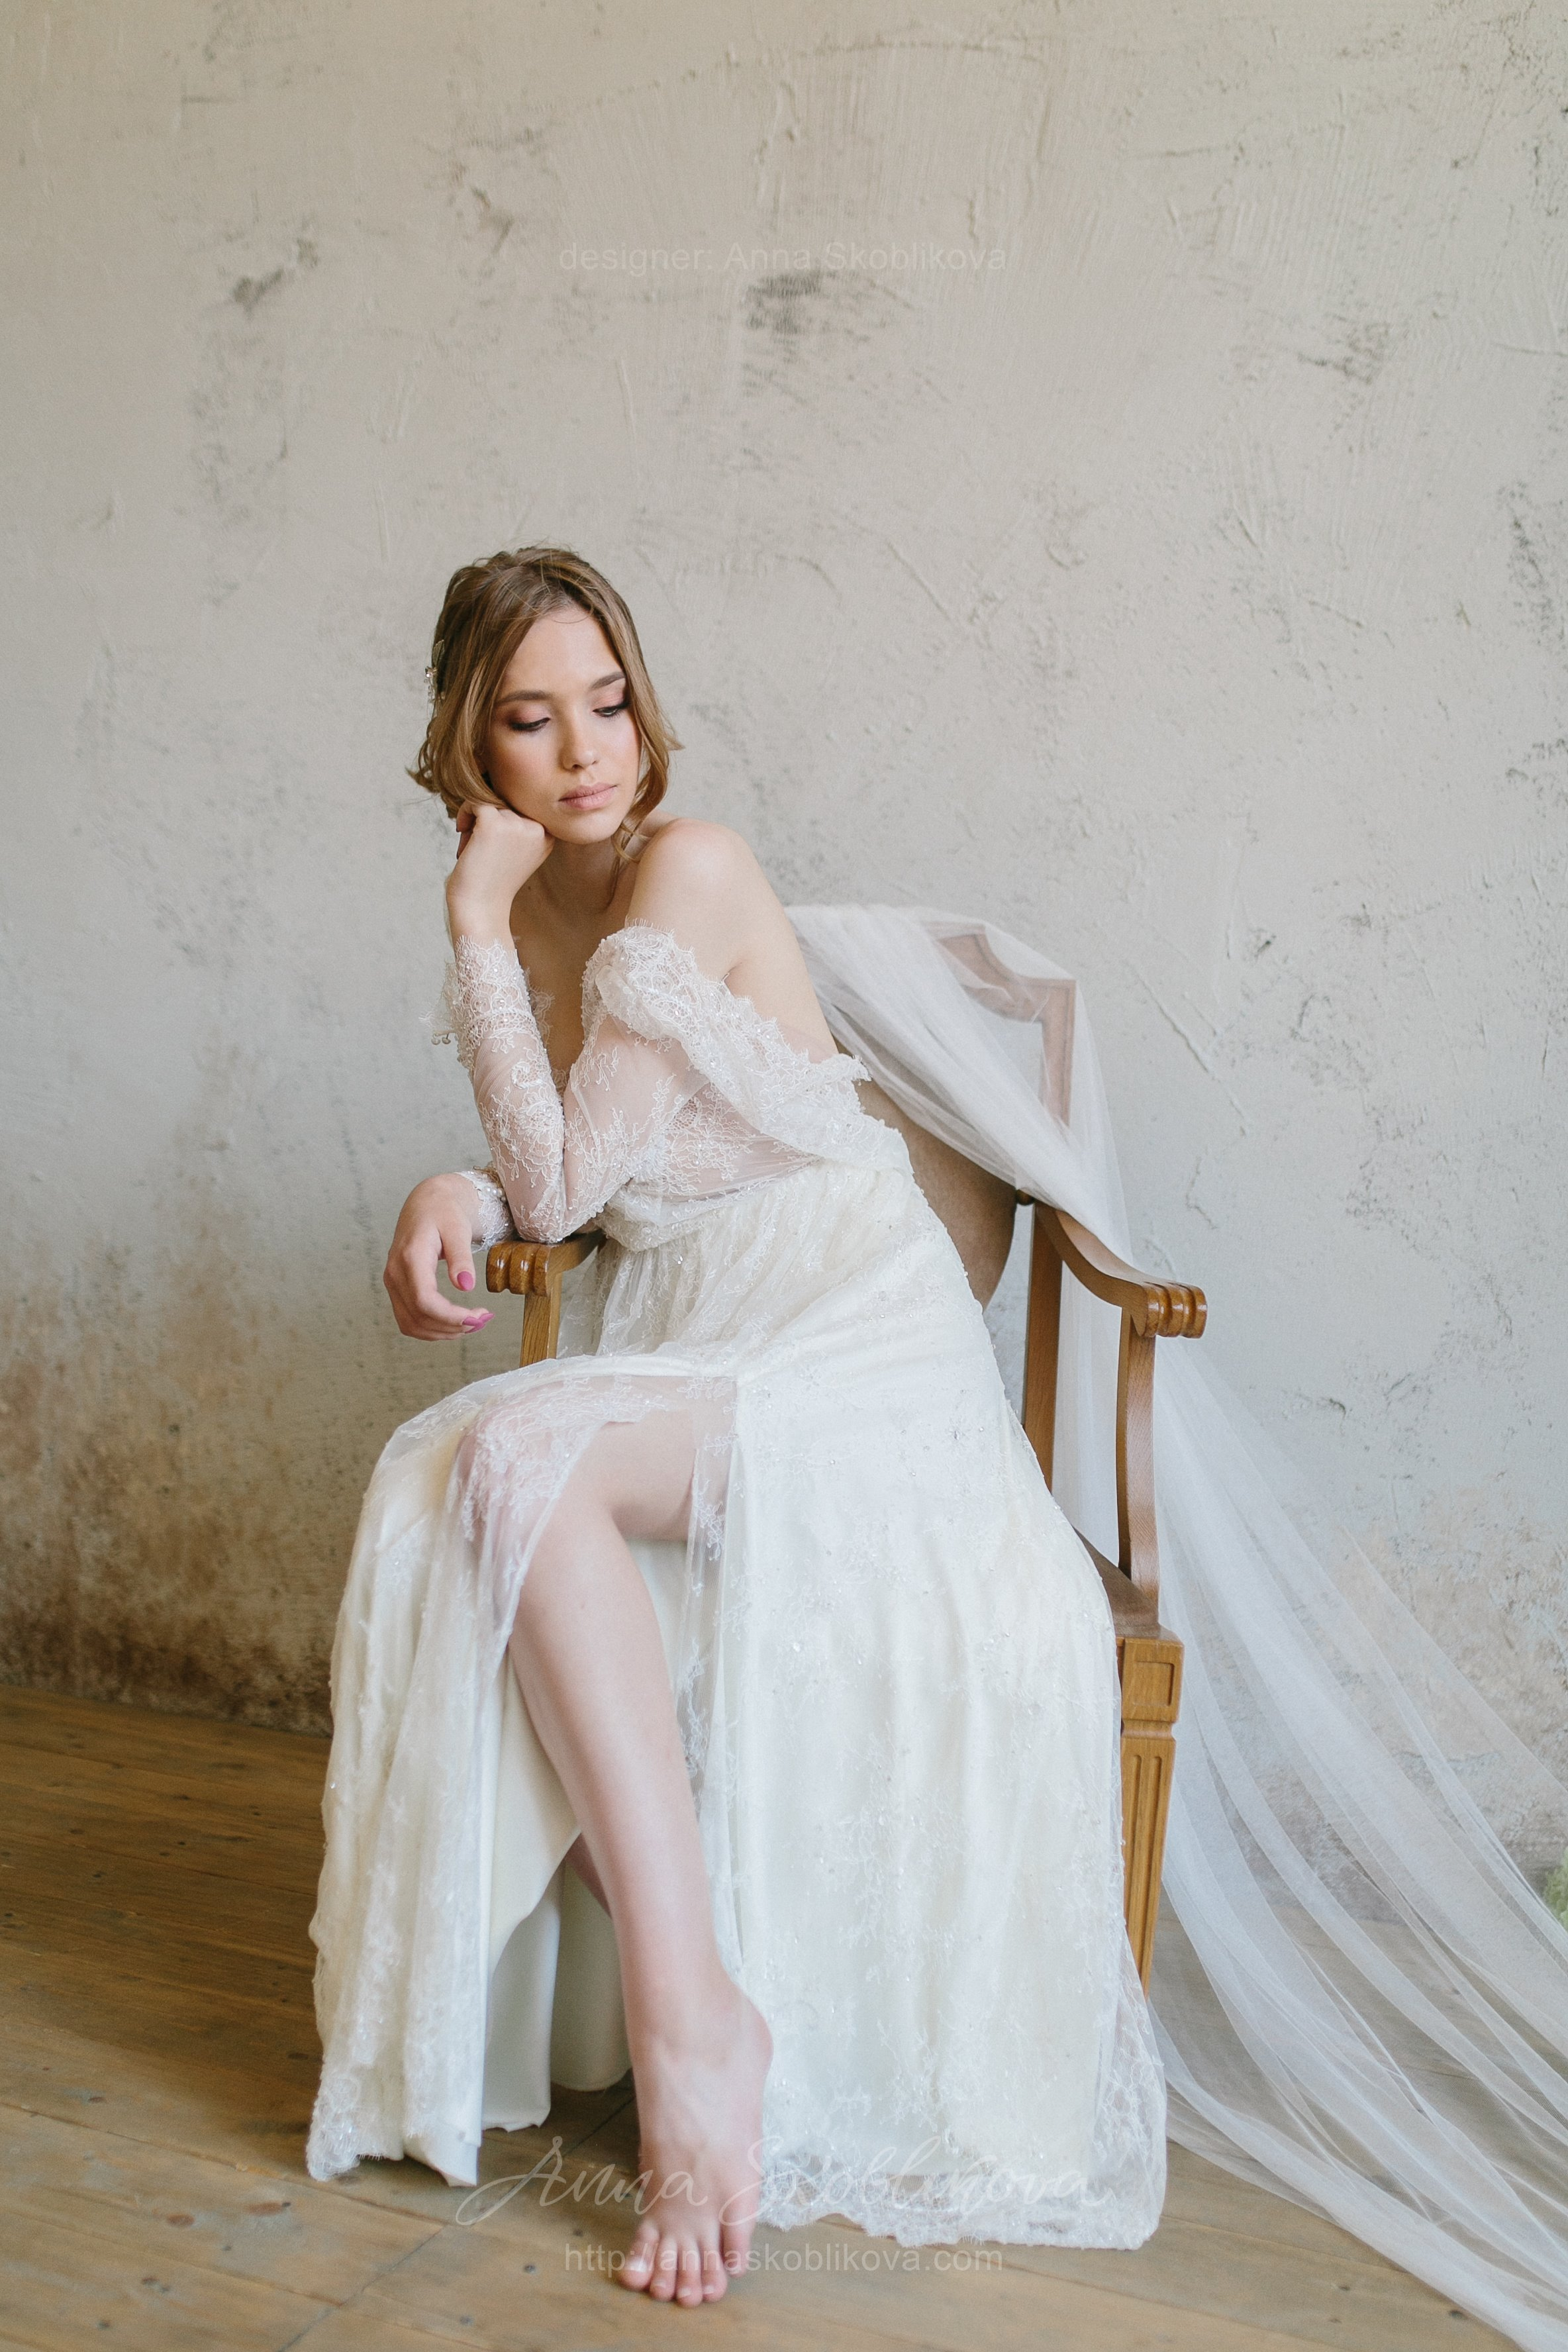 Wedding dress - Aimee - Shining like a morning dew crystals make a ...